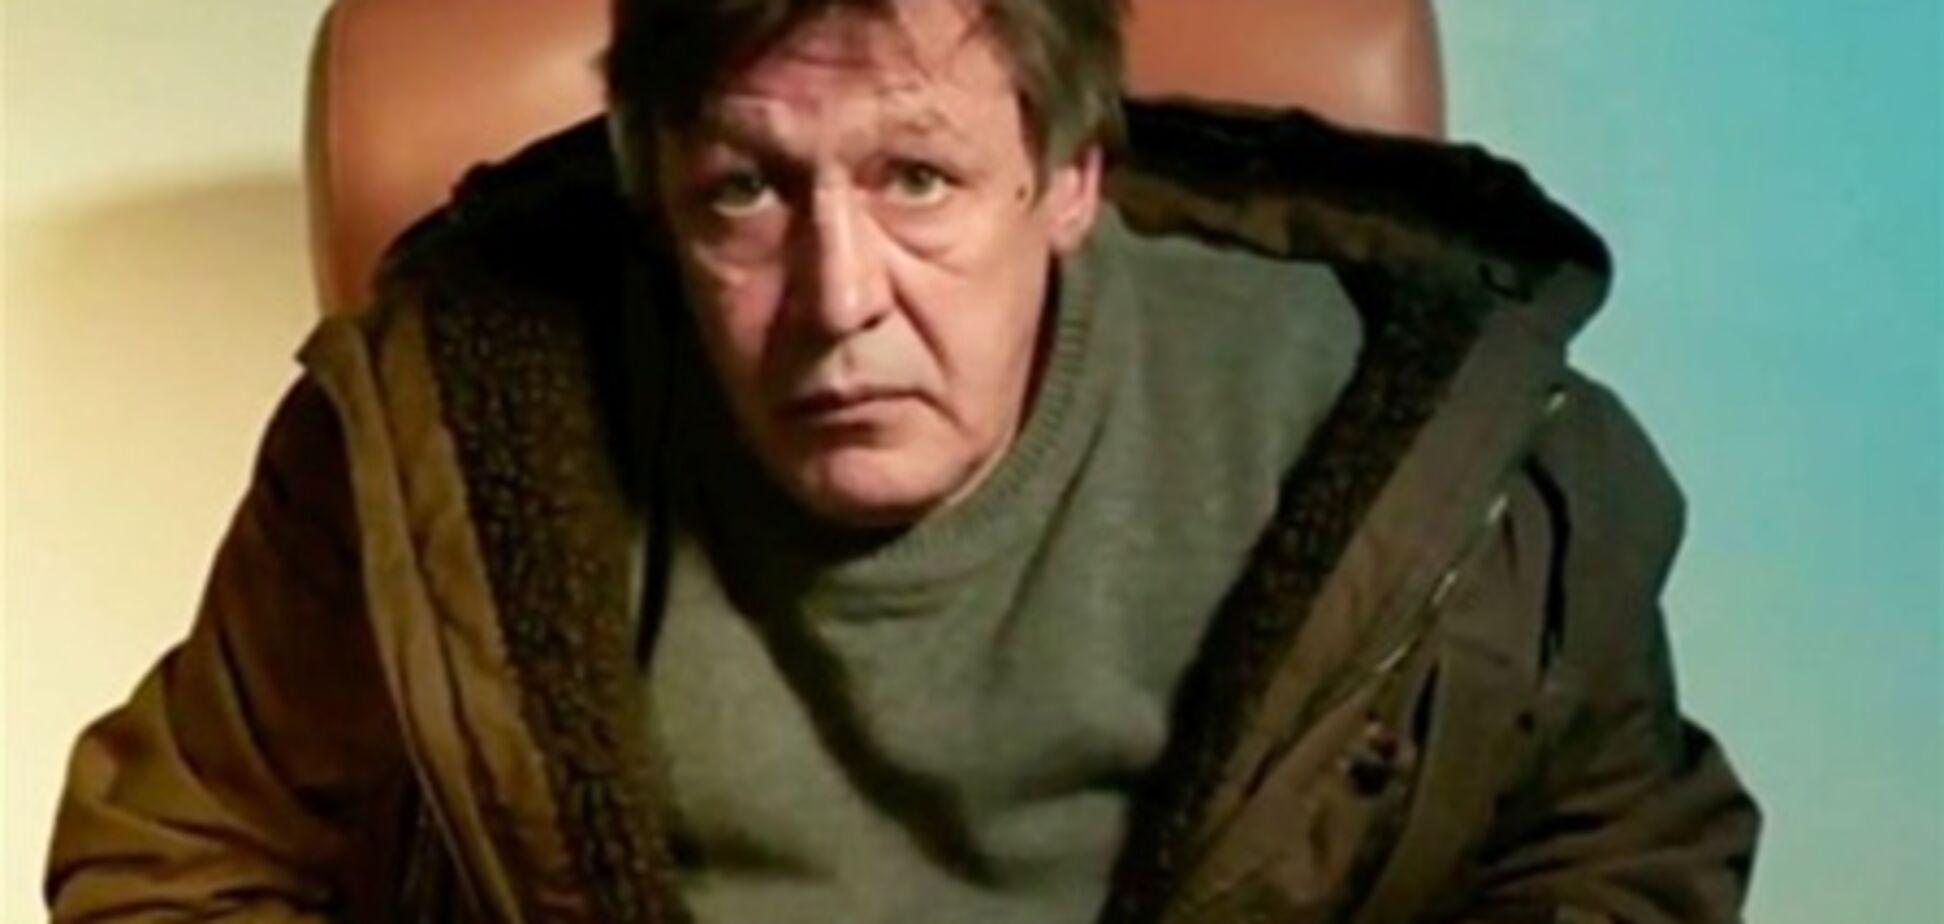 Єфремов заробив на проекті 'Громадянин поет' $ 1 млн